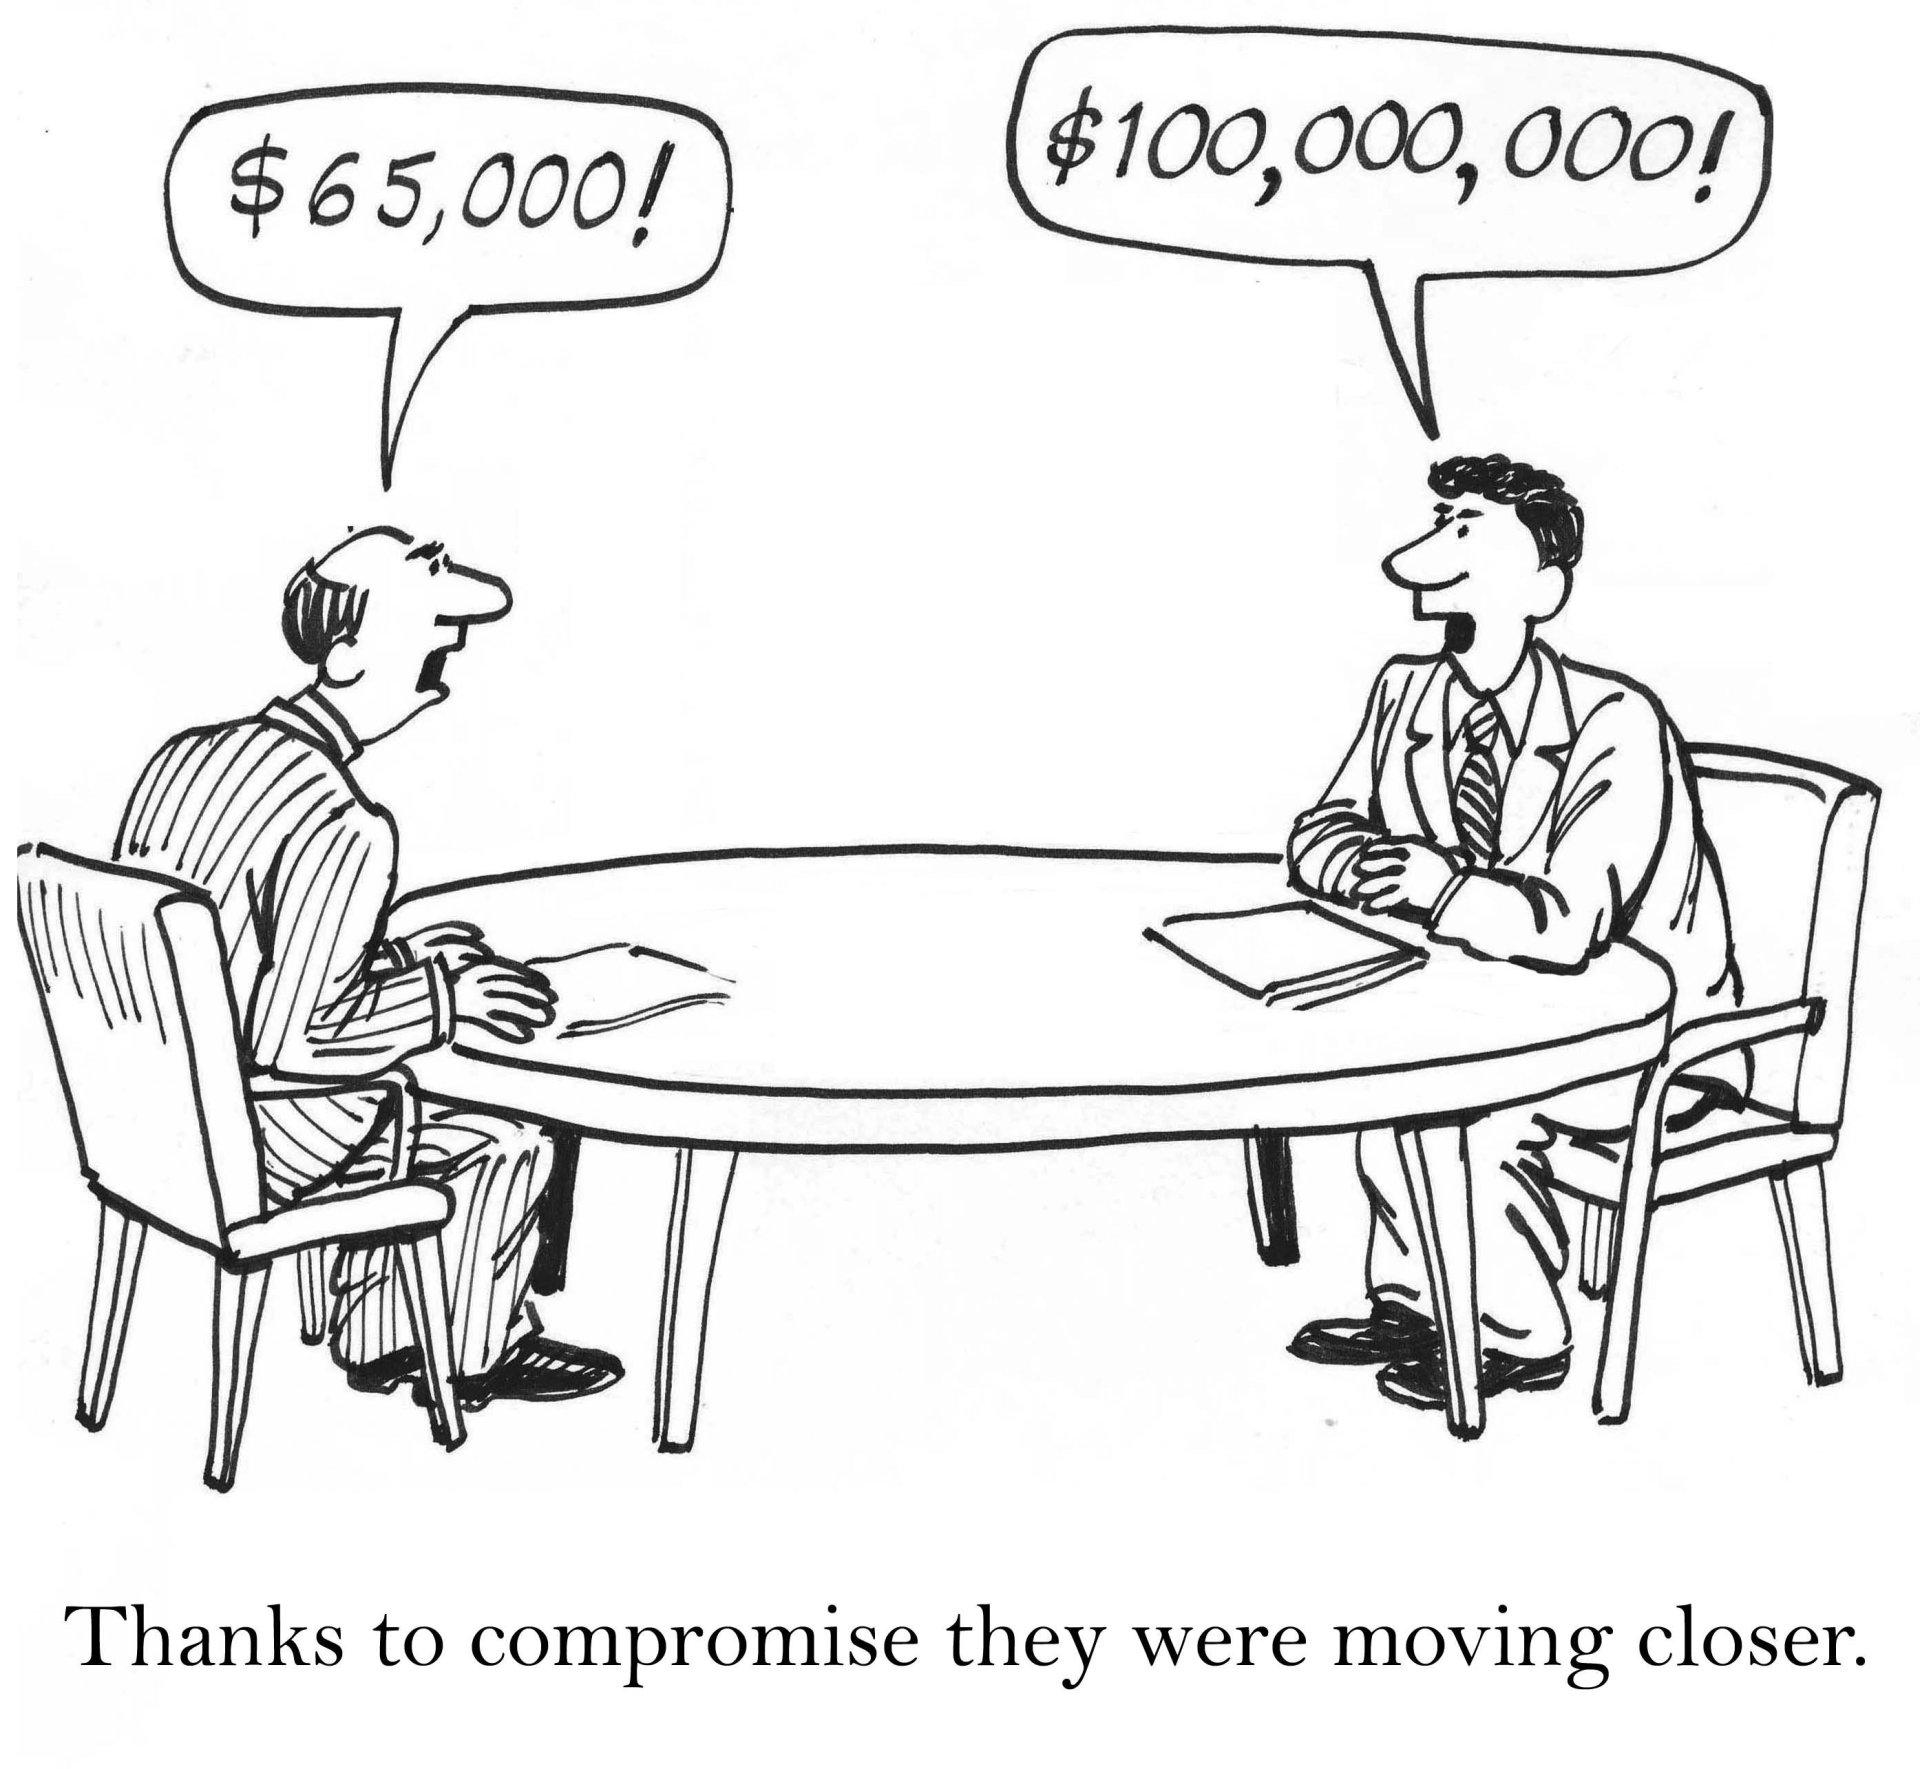 Negotiating Real Estate